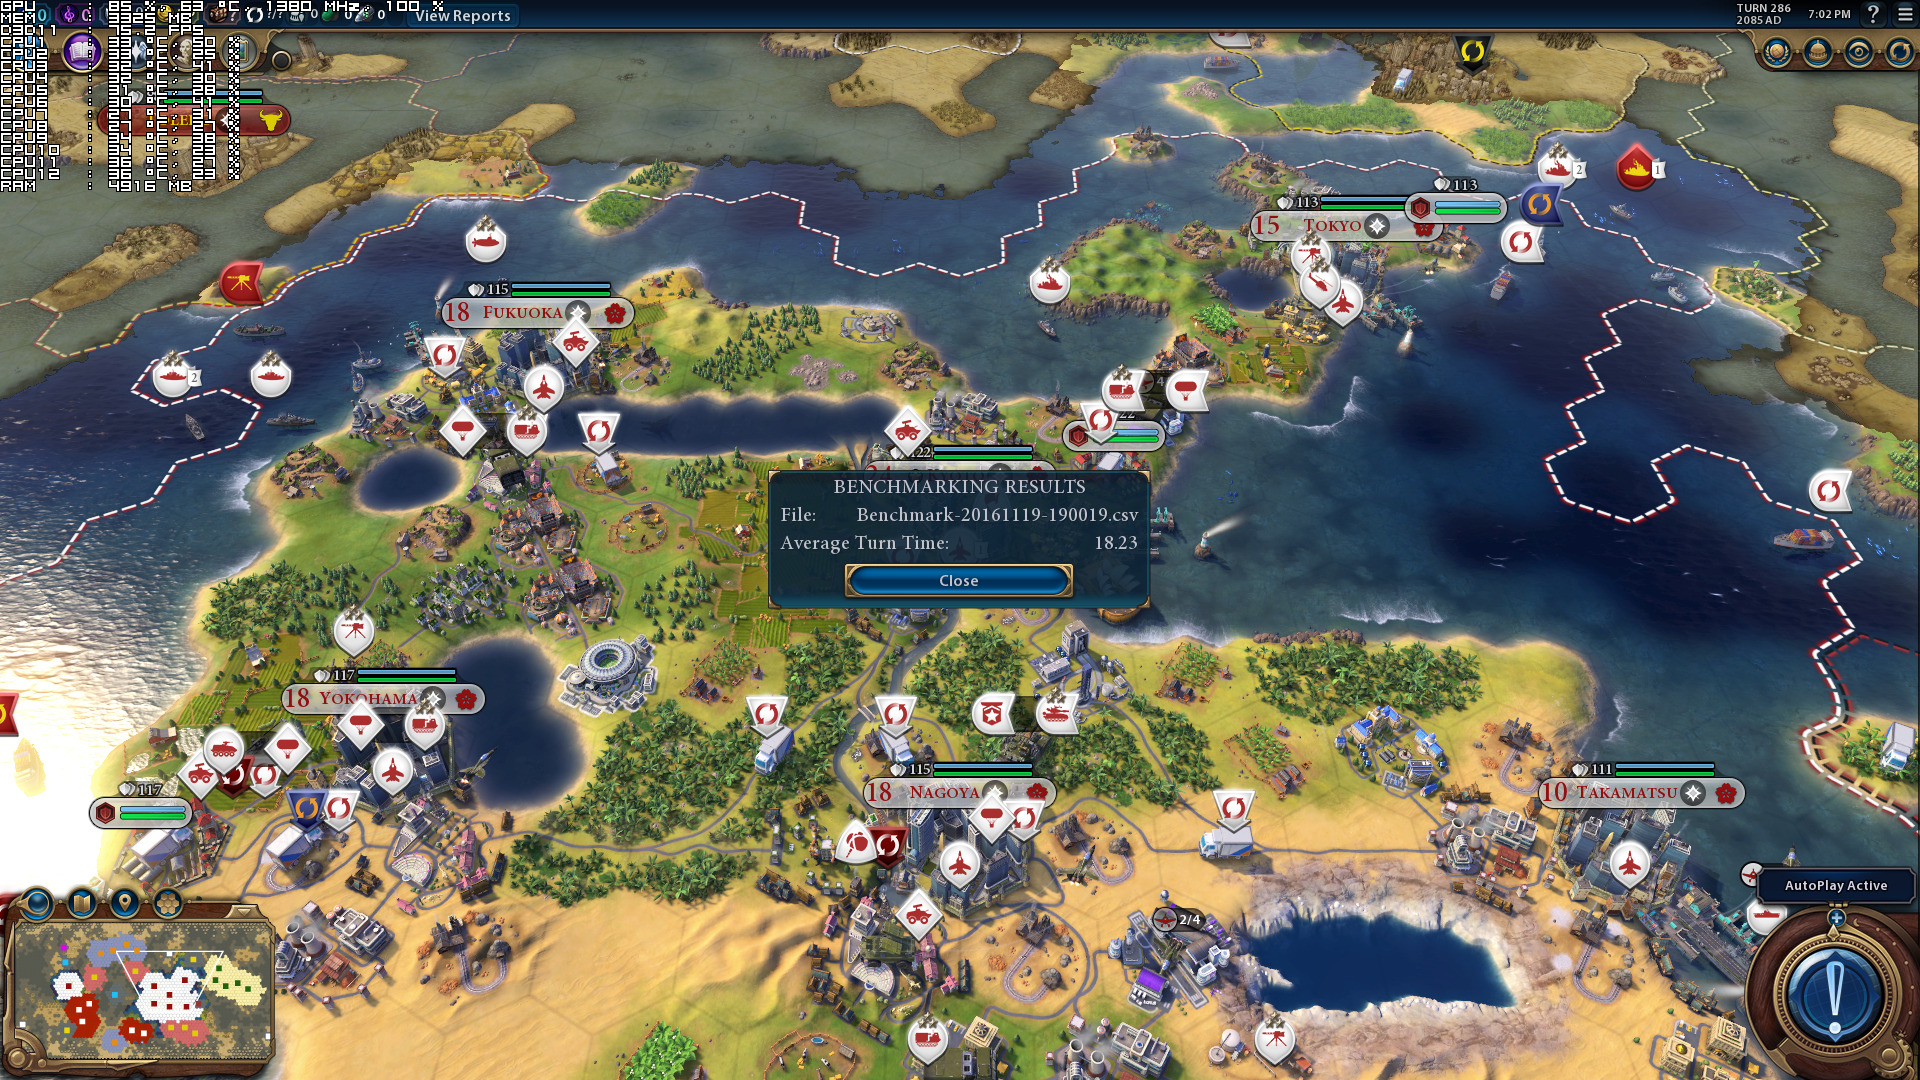 Sid Meier\u0027s Civilization VI \u2013 DX11 versus DX12 performance